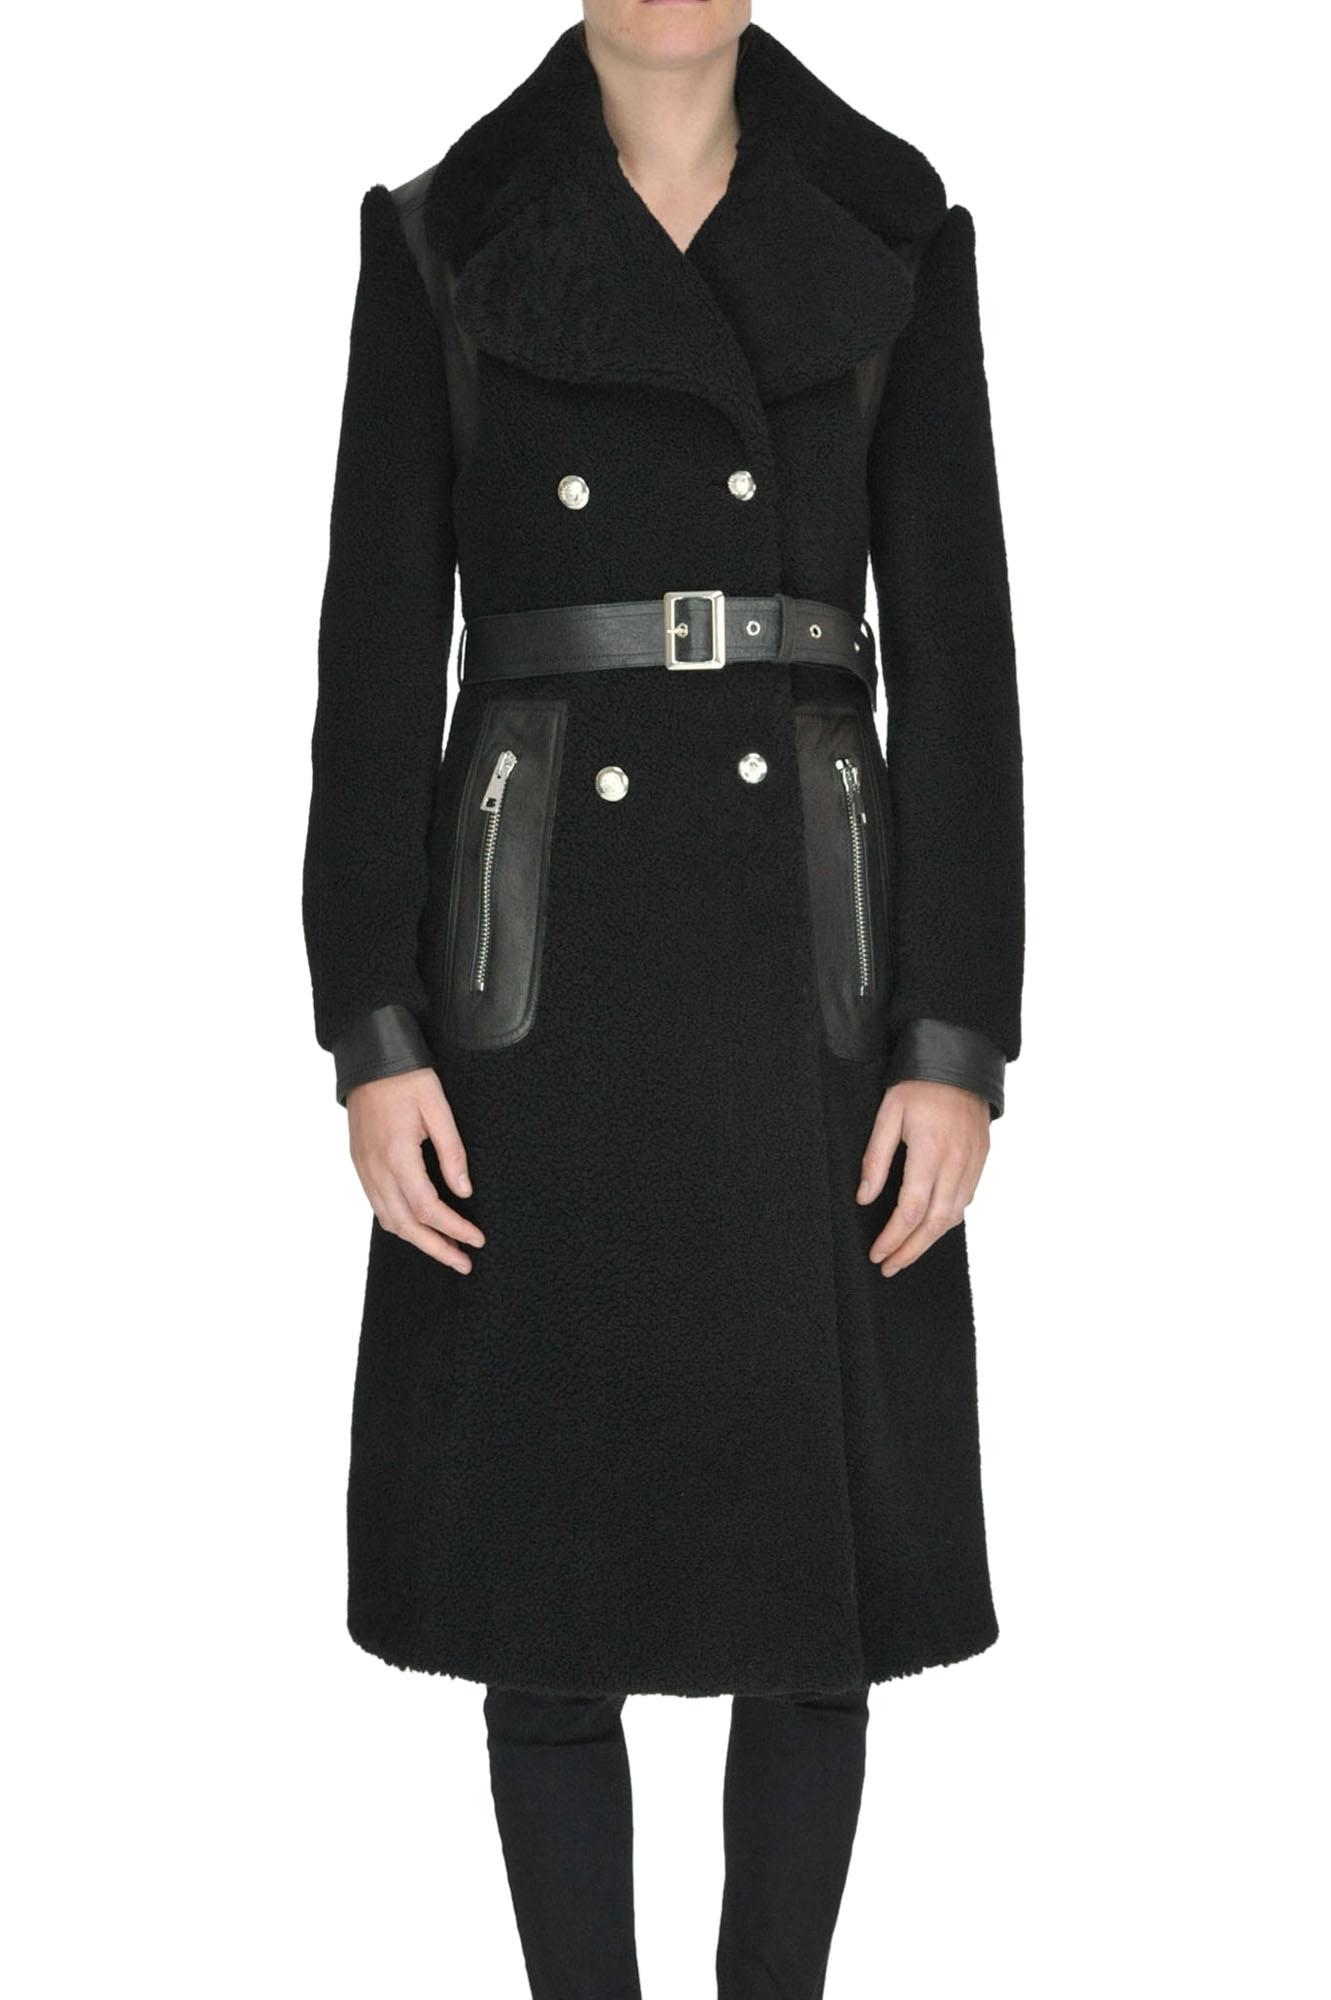 B&W Shearling Coat in Black